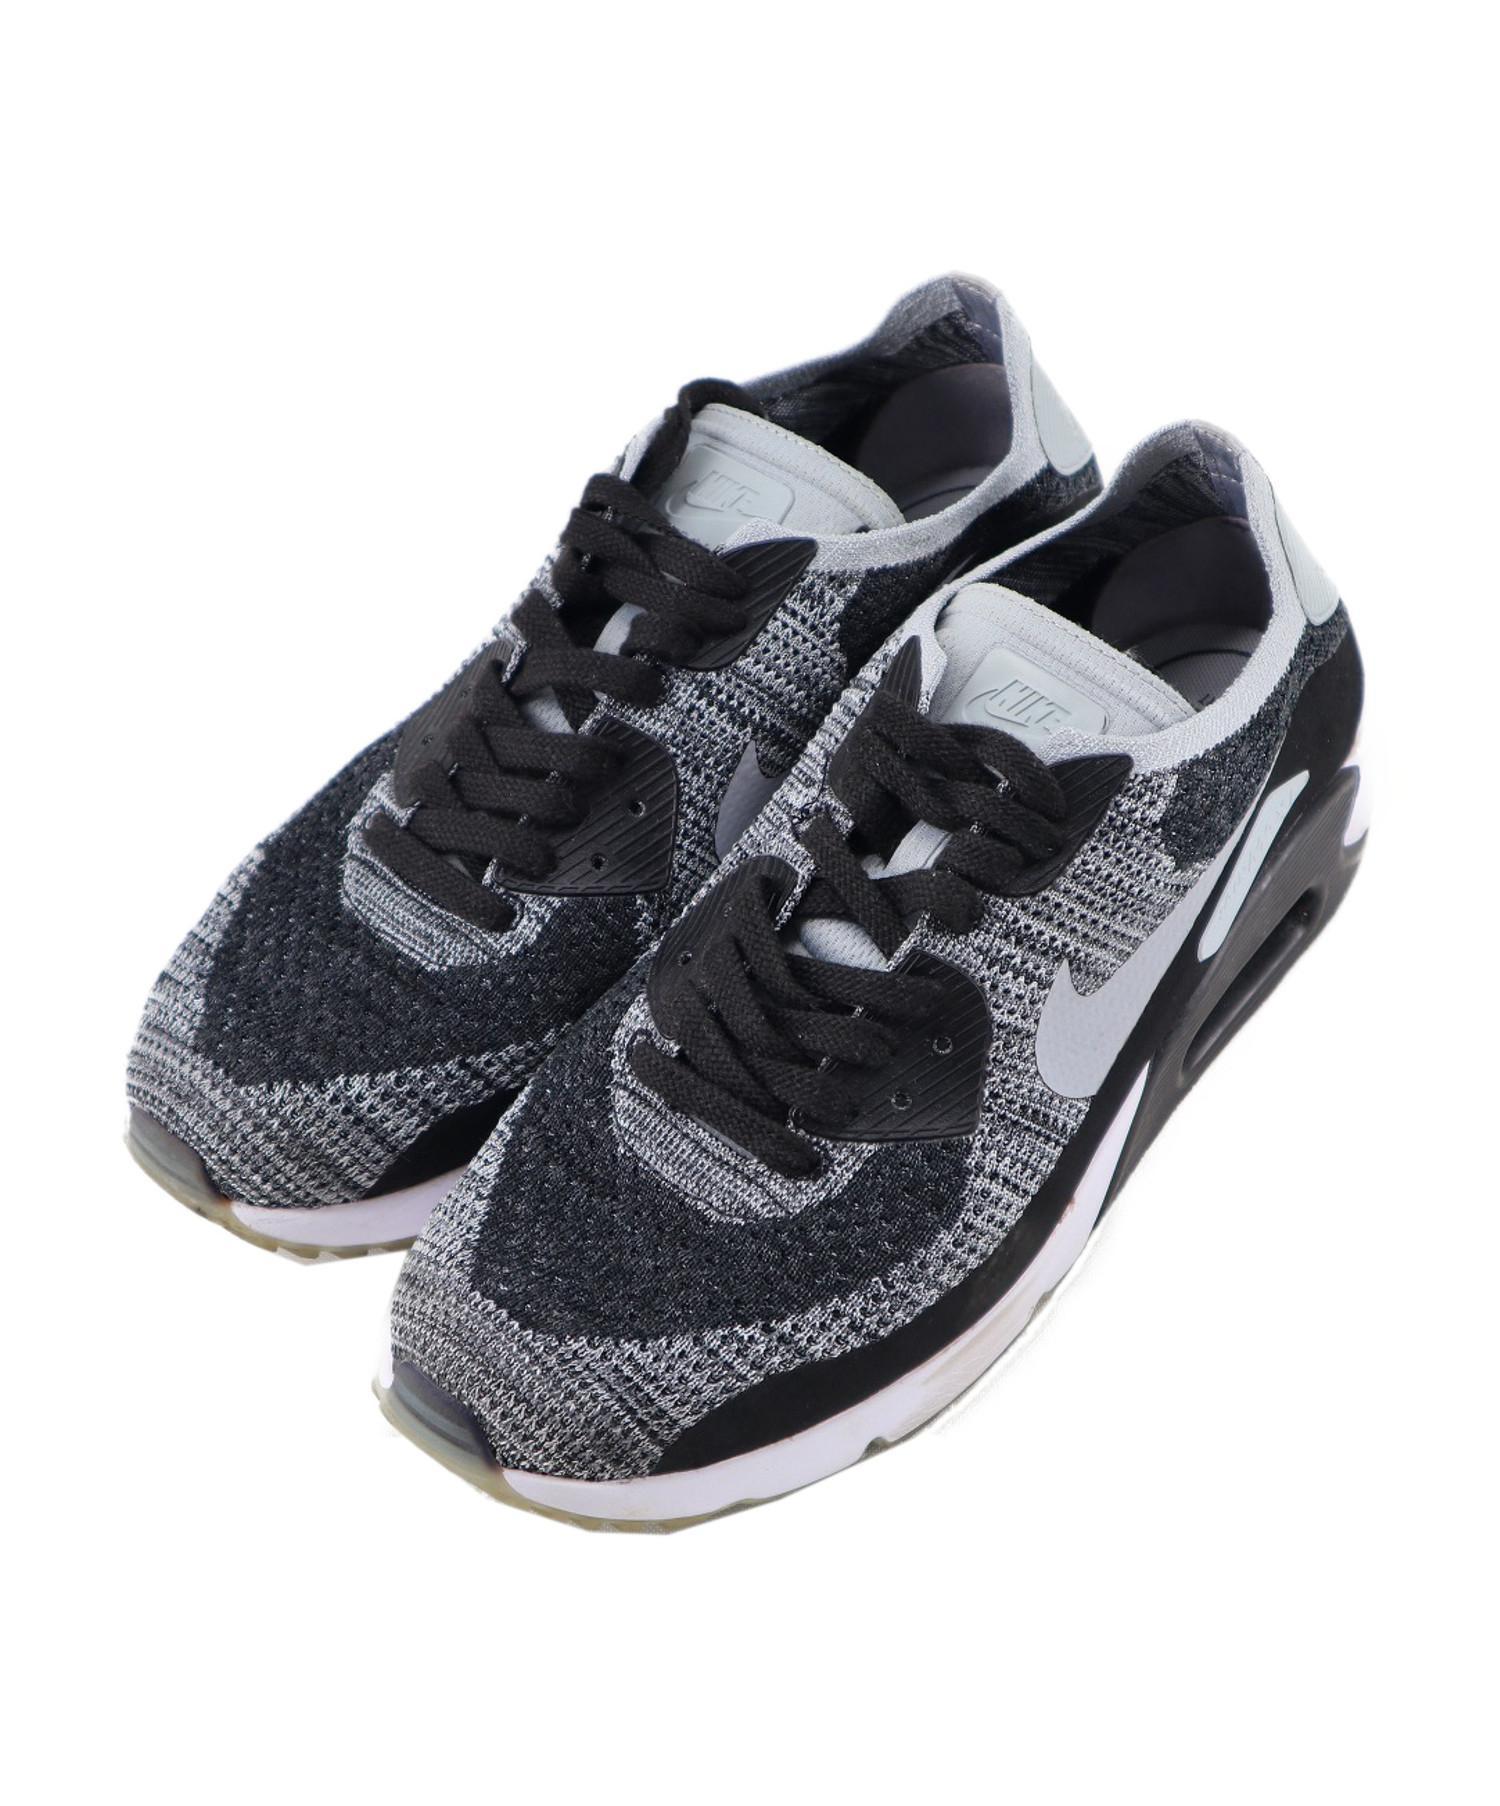 Air Max 90 Ultra 2.0 Flyknit Nike 875943 005 black